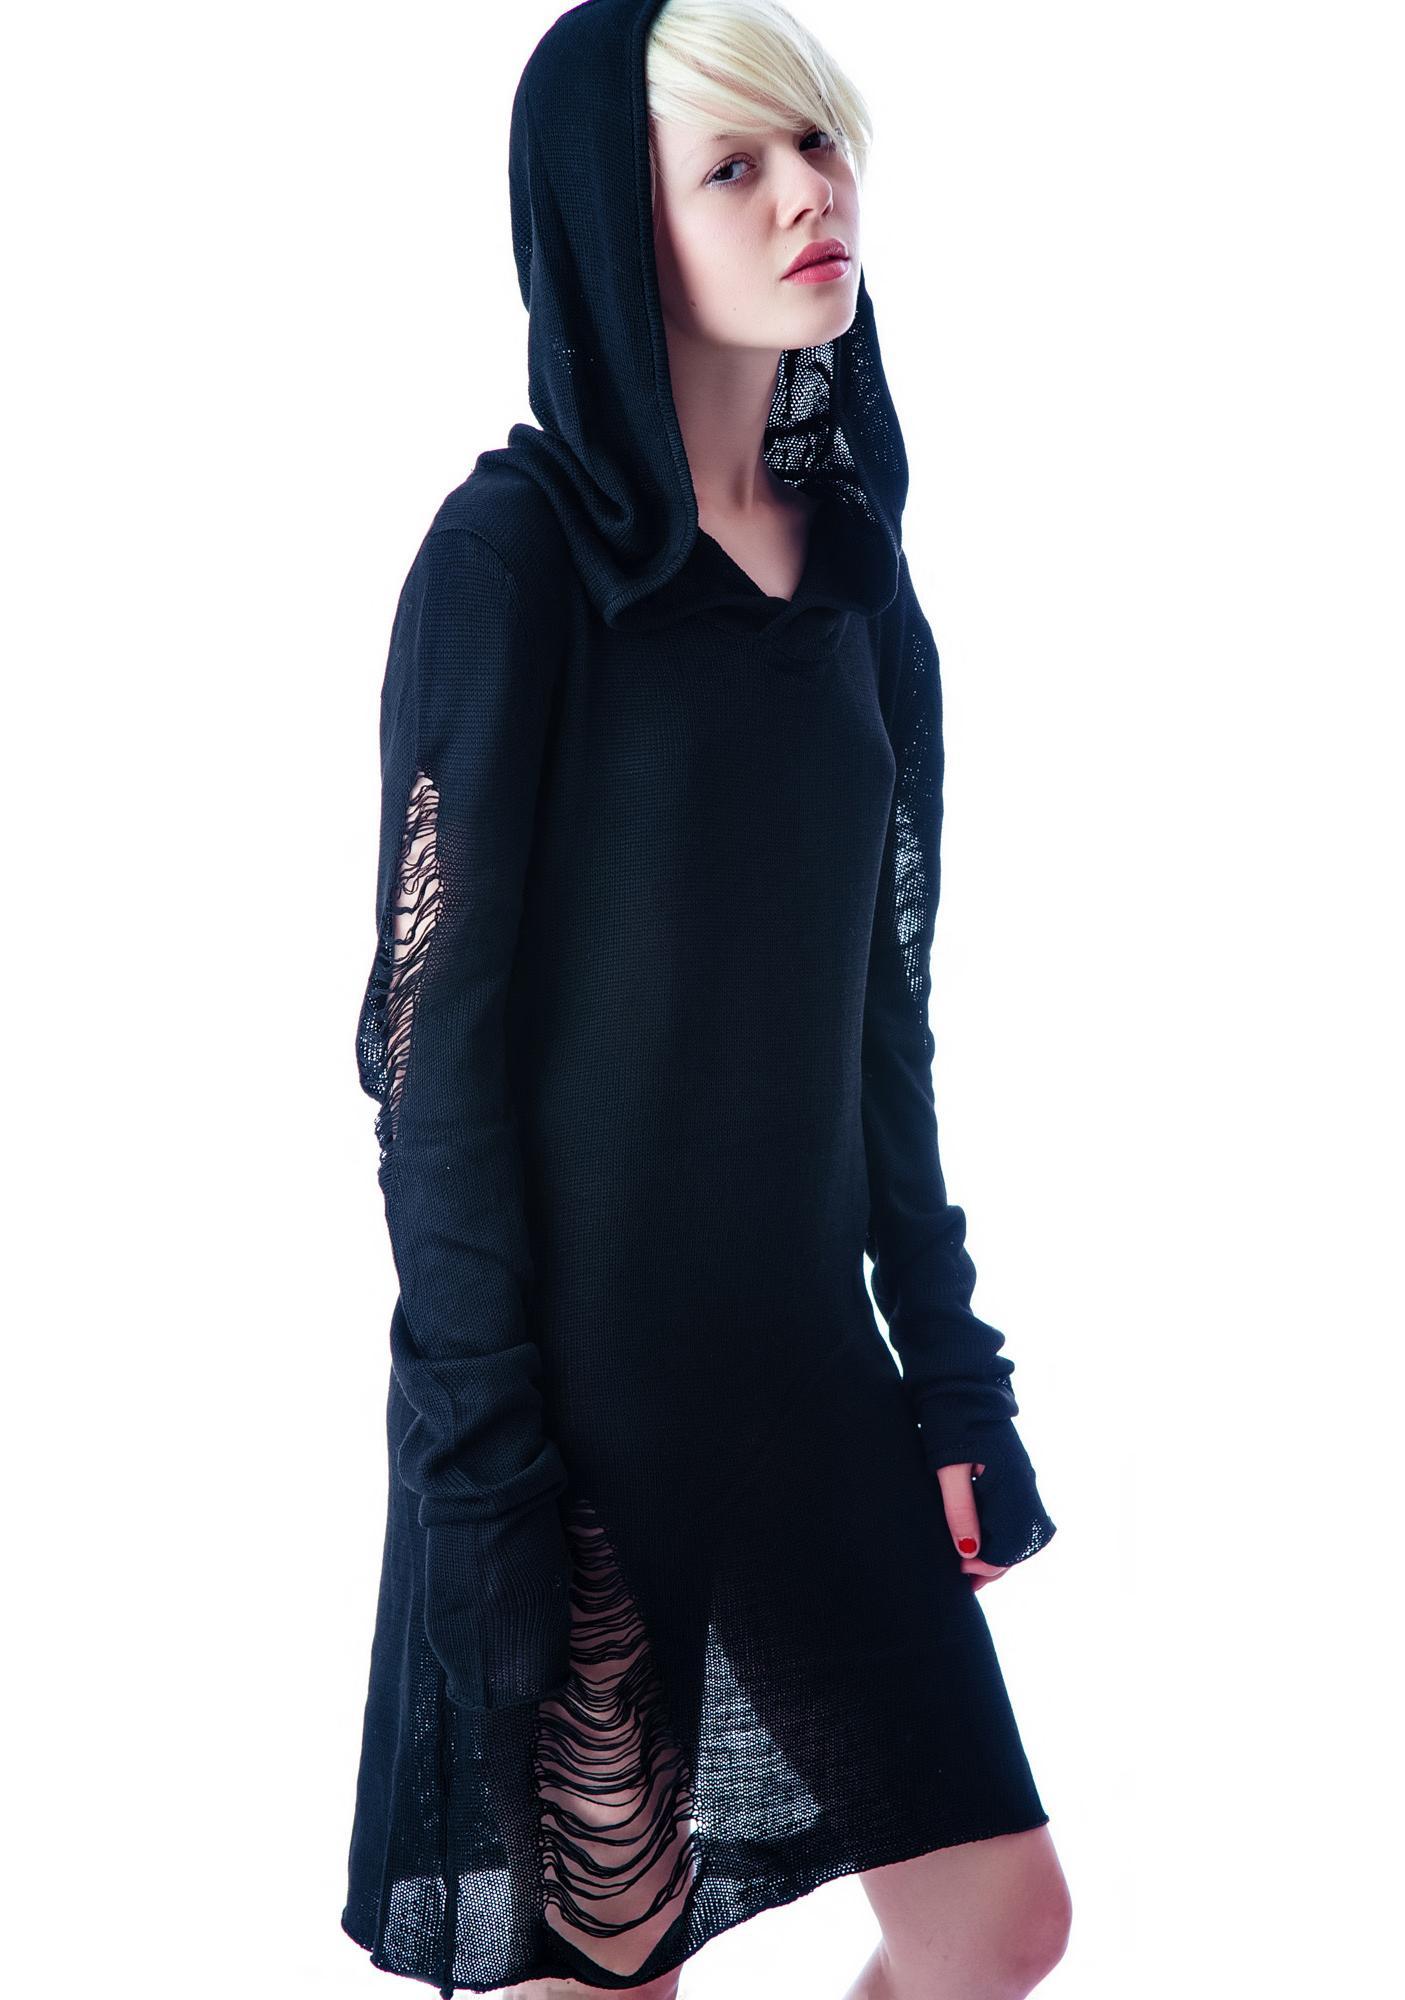 Widow Tattered Hooded Sweater Dress